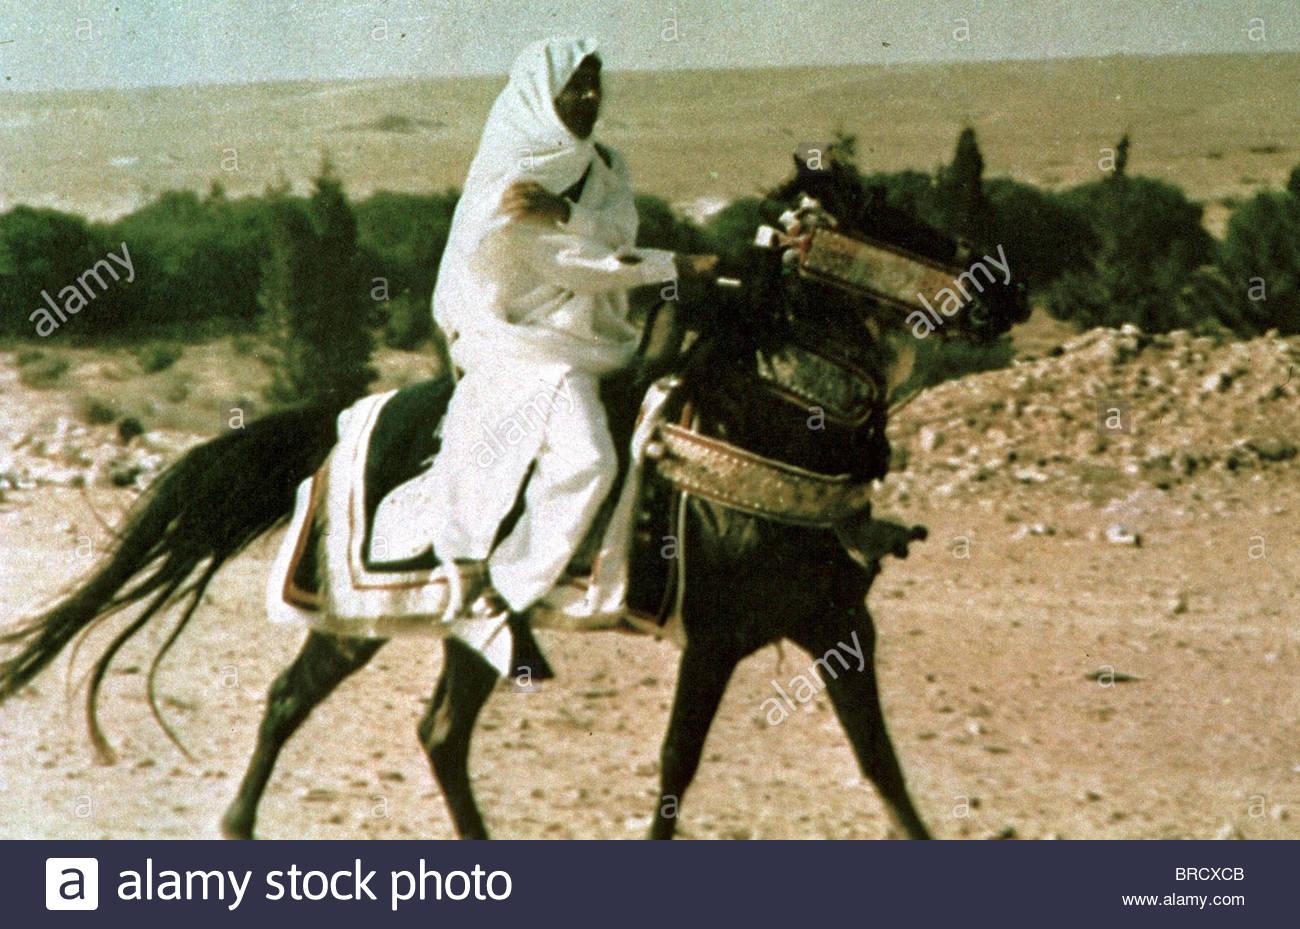 COLONEL MOAMMAR GADHAFI LIBYA ON HORSEBACK - Stock Image